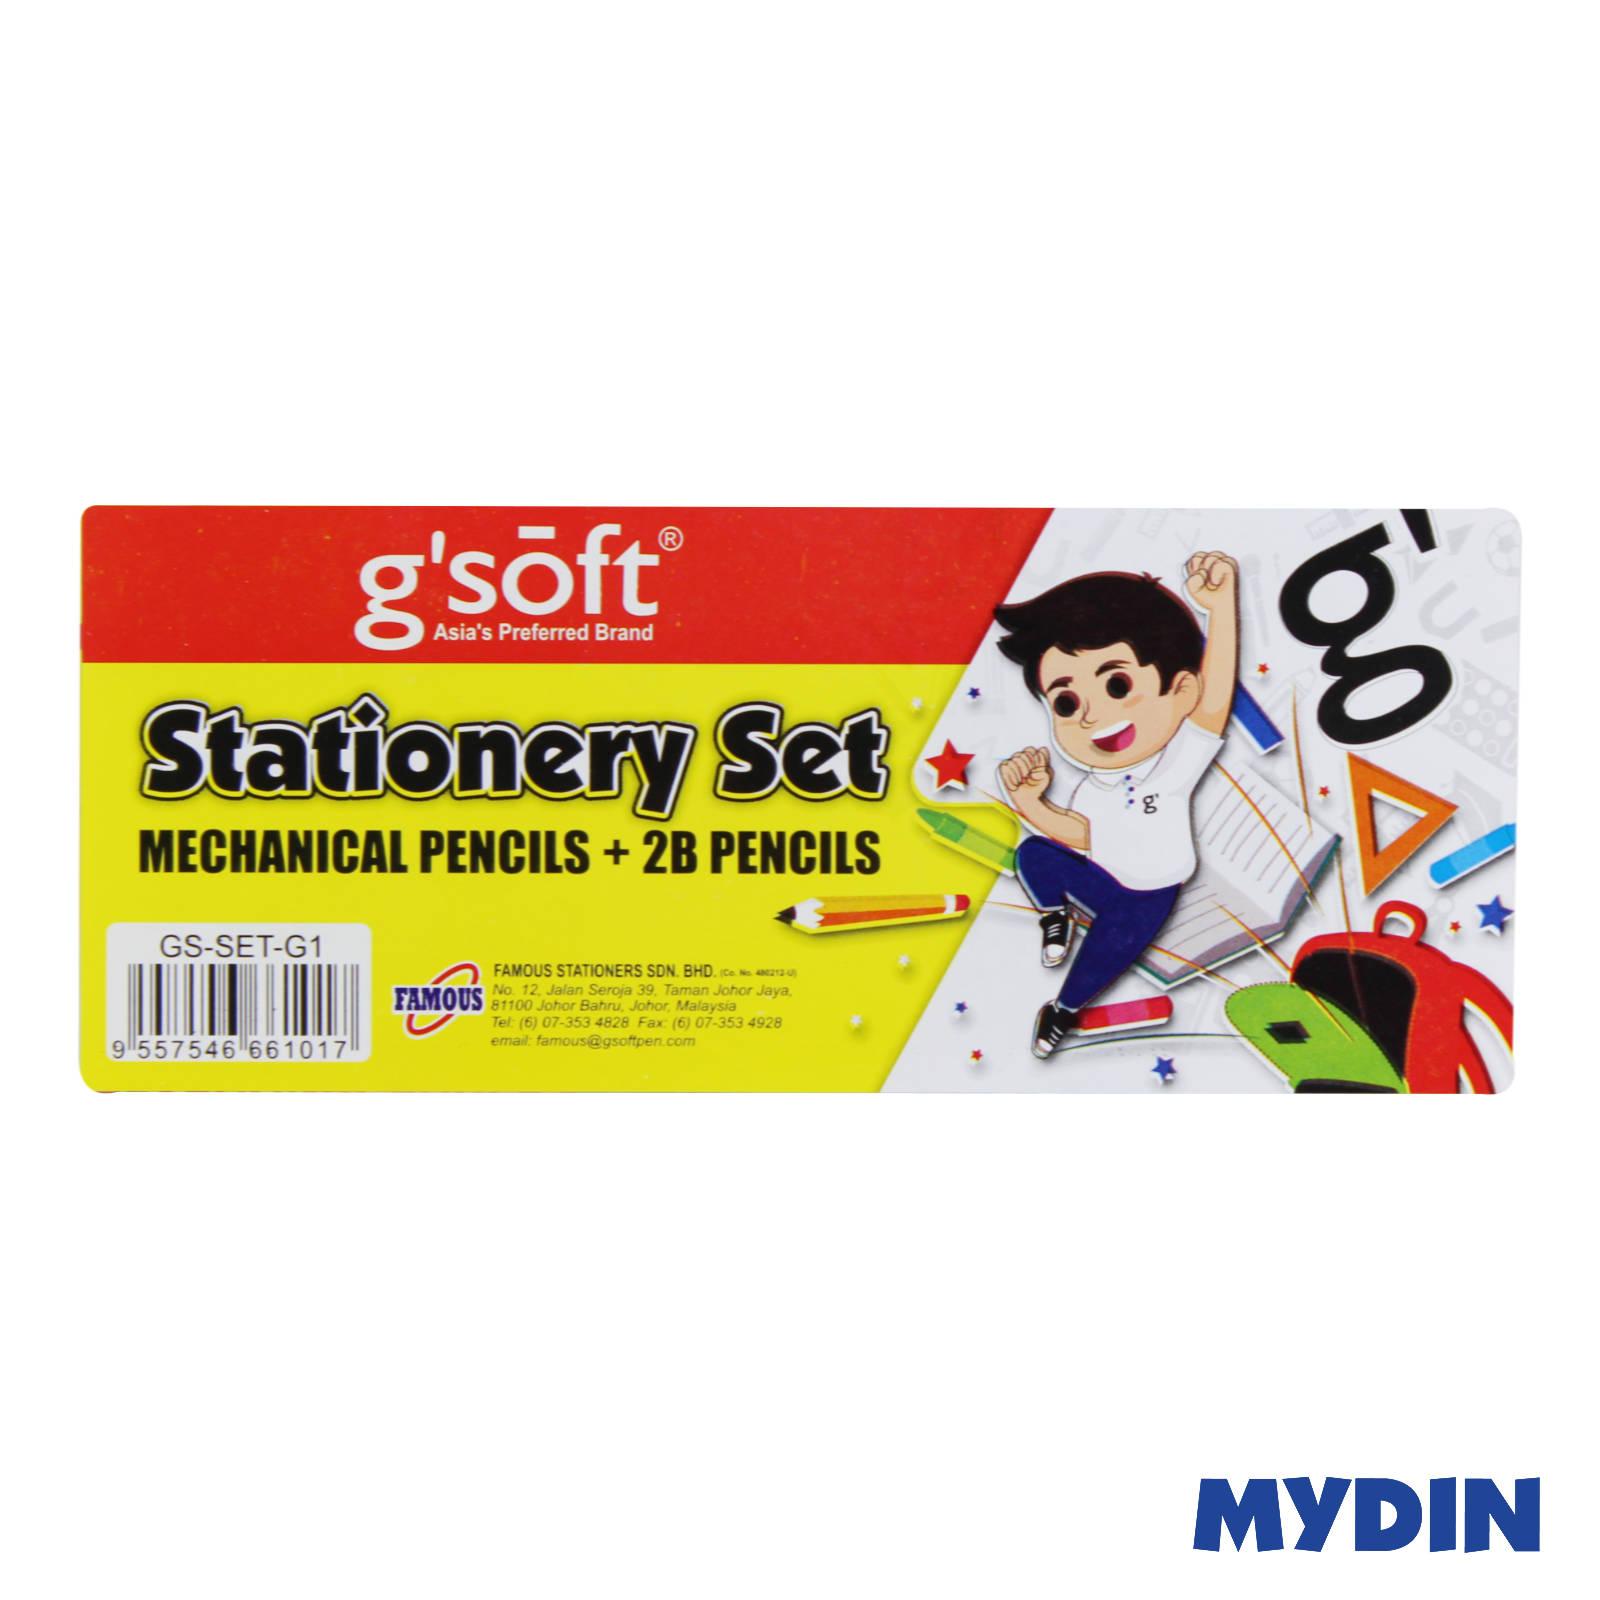 G'soft Mechanical Pen and 2B Pencil Stationery Set GS-SET-G1